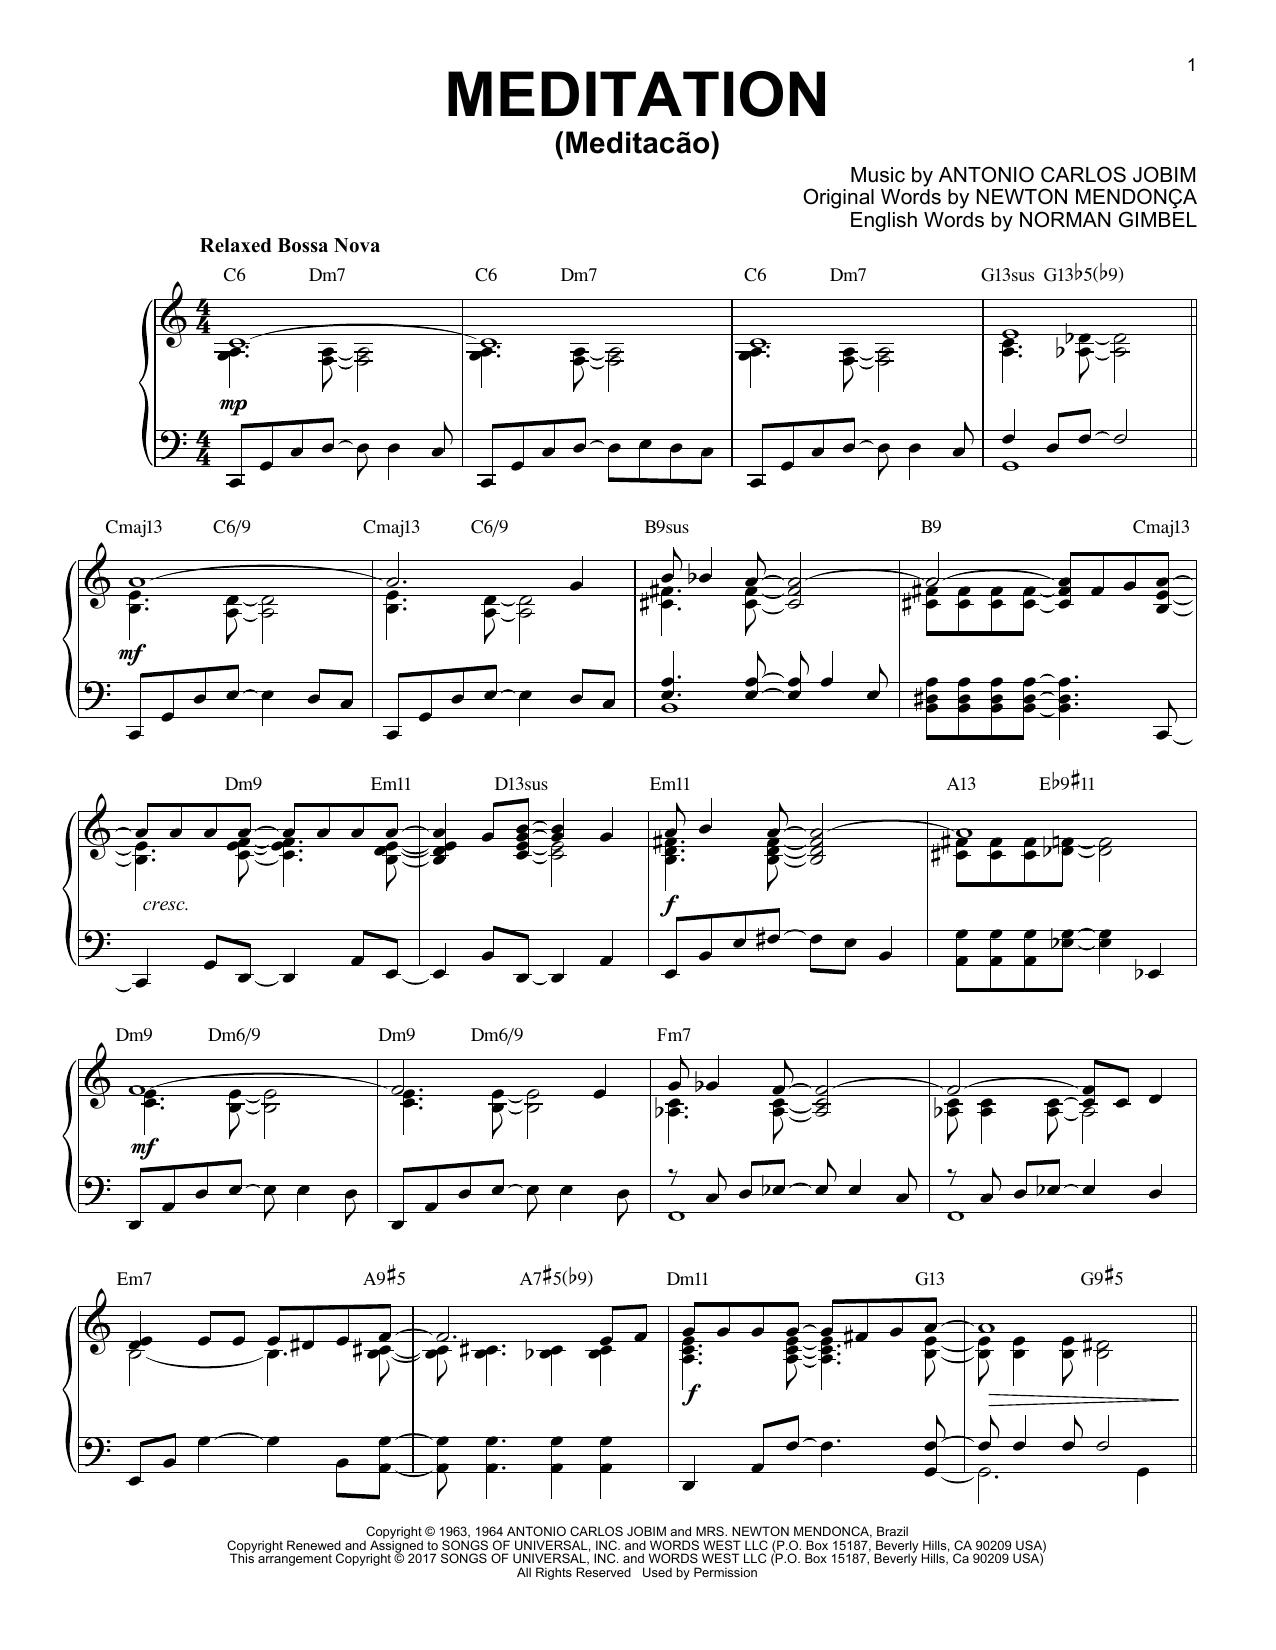 Antonio Carlos Jobim Meditation (Meditacao) [Jazz version] sheet music notes and chords. Download Printable PDF.